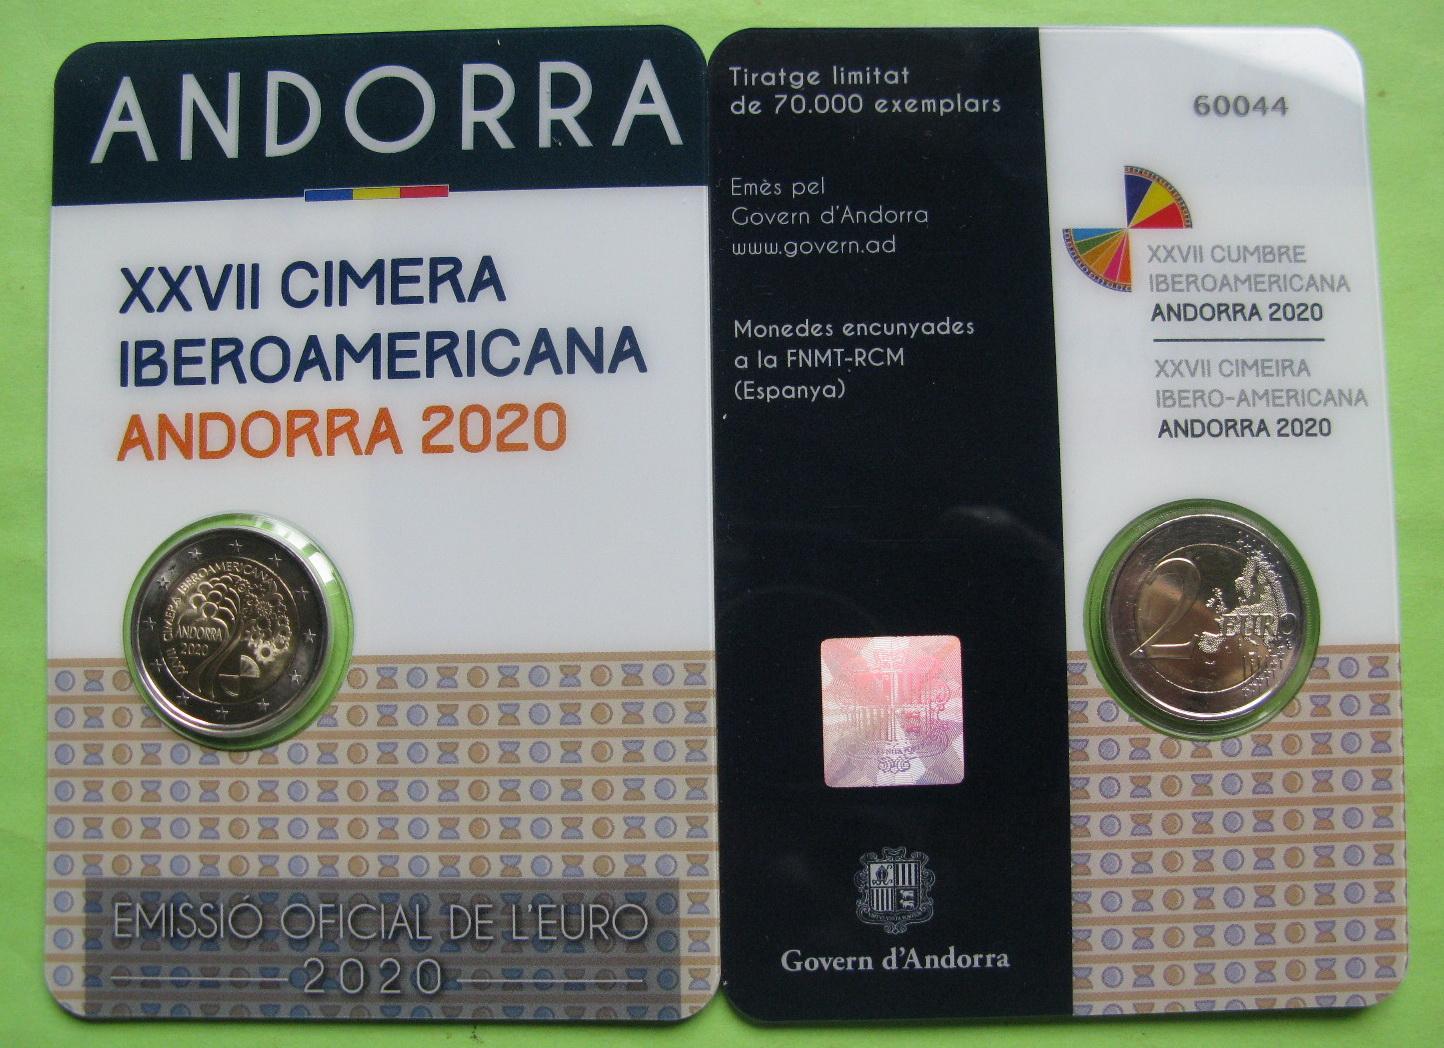 Андорра 2 евро 2020 г.XXVII Иберо-американский саммит в Андорре